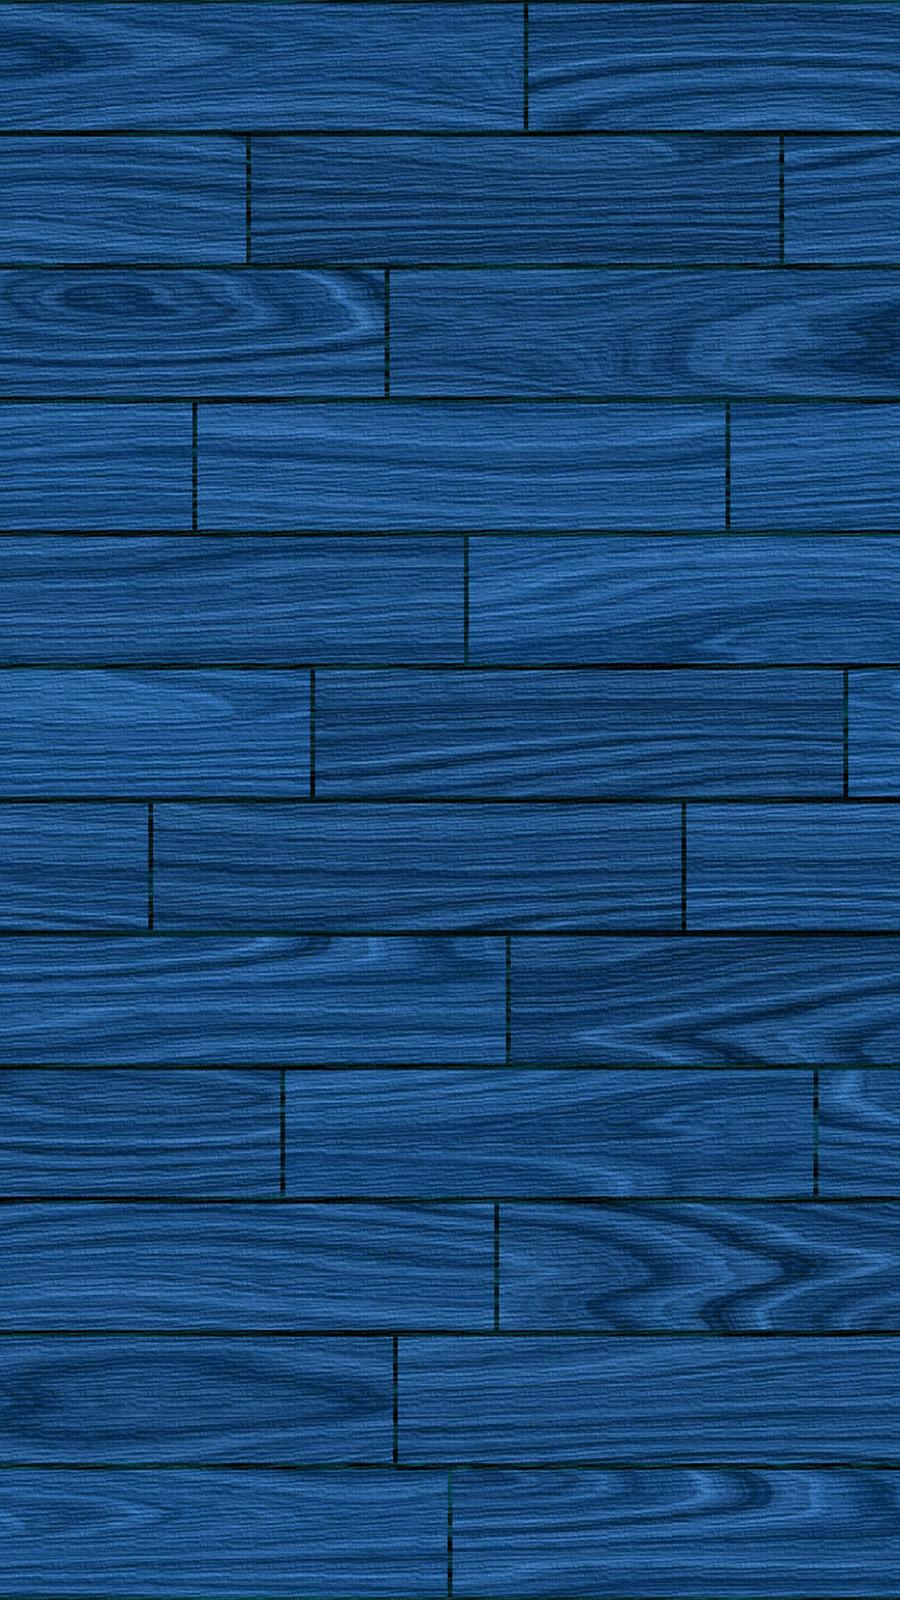 Basic Blue Wooden Wallpaper